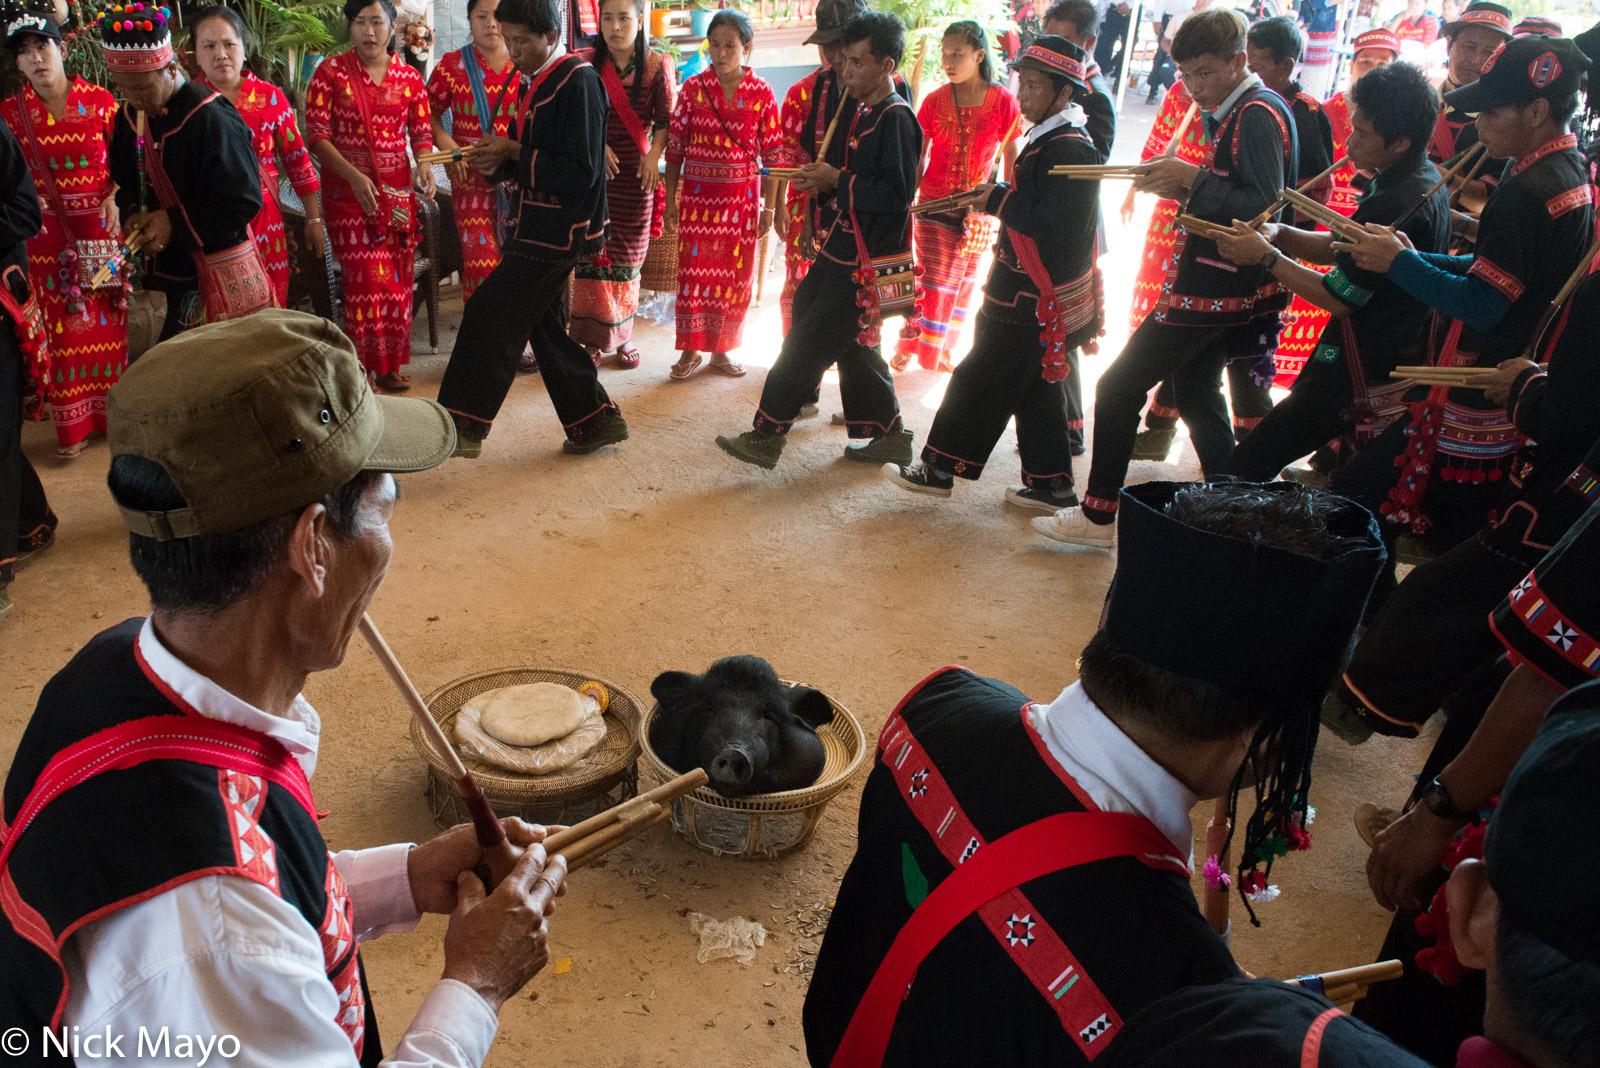 Burma, Circling, Festival, Lahu, Piping, Shan State, photo